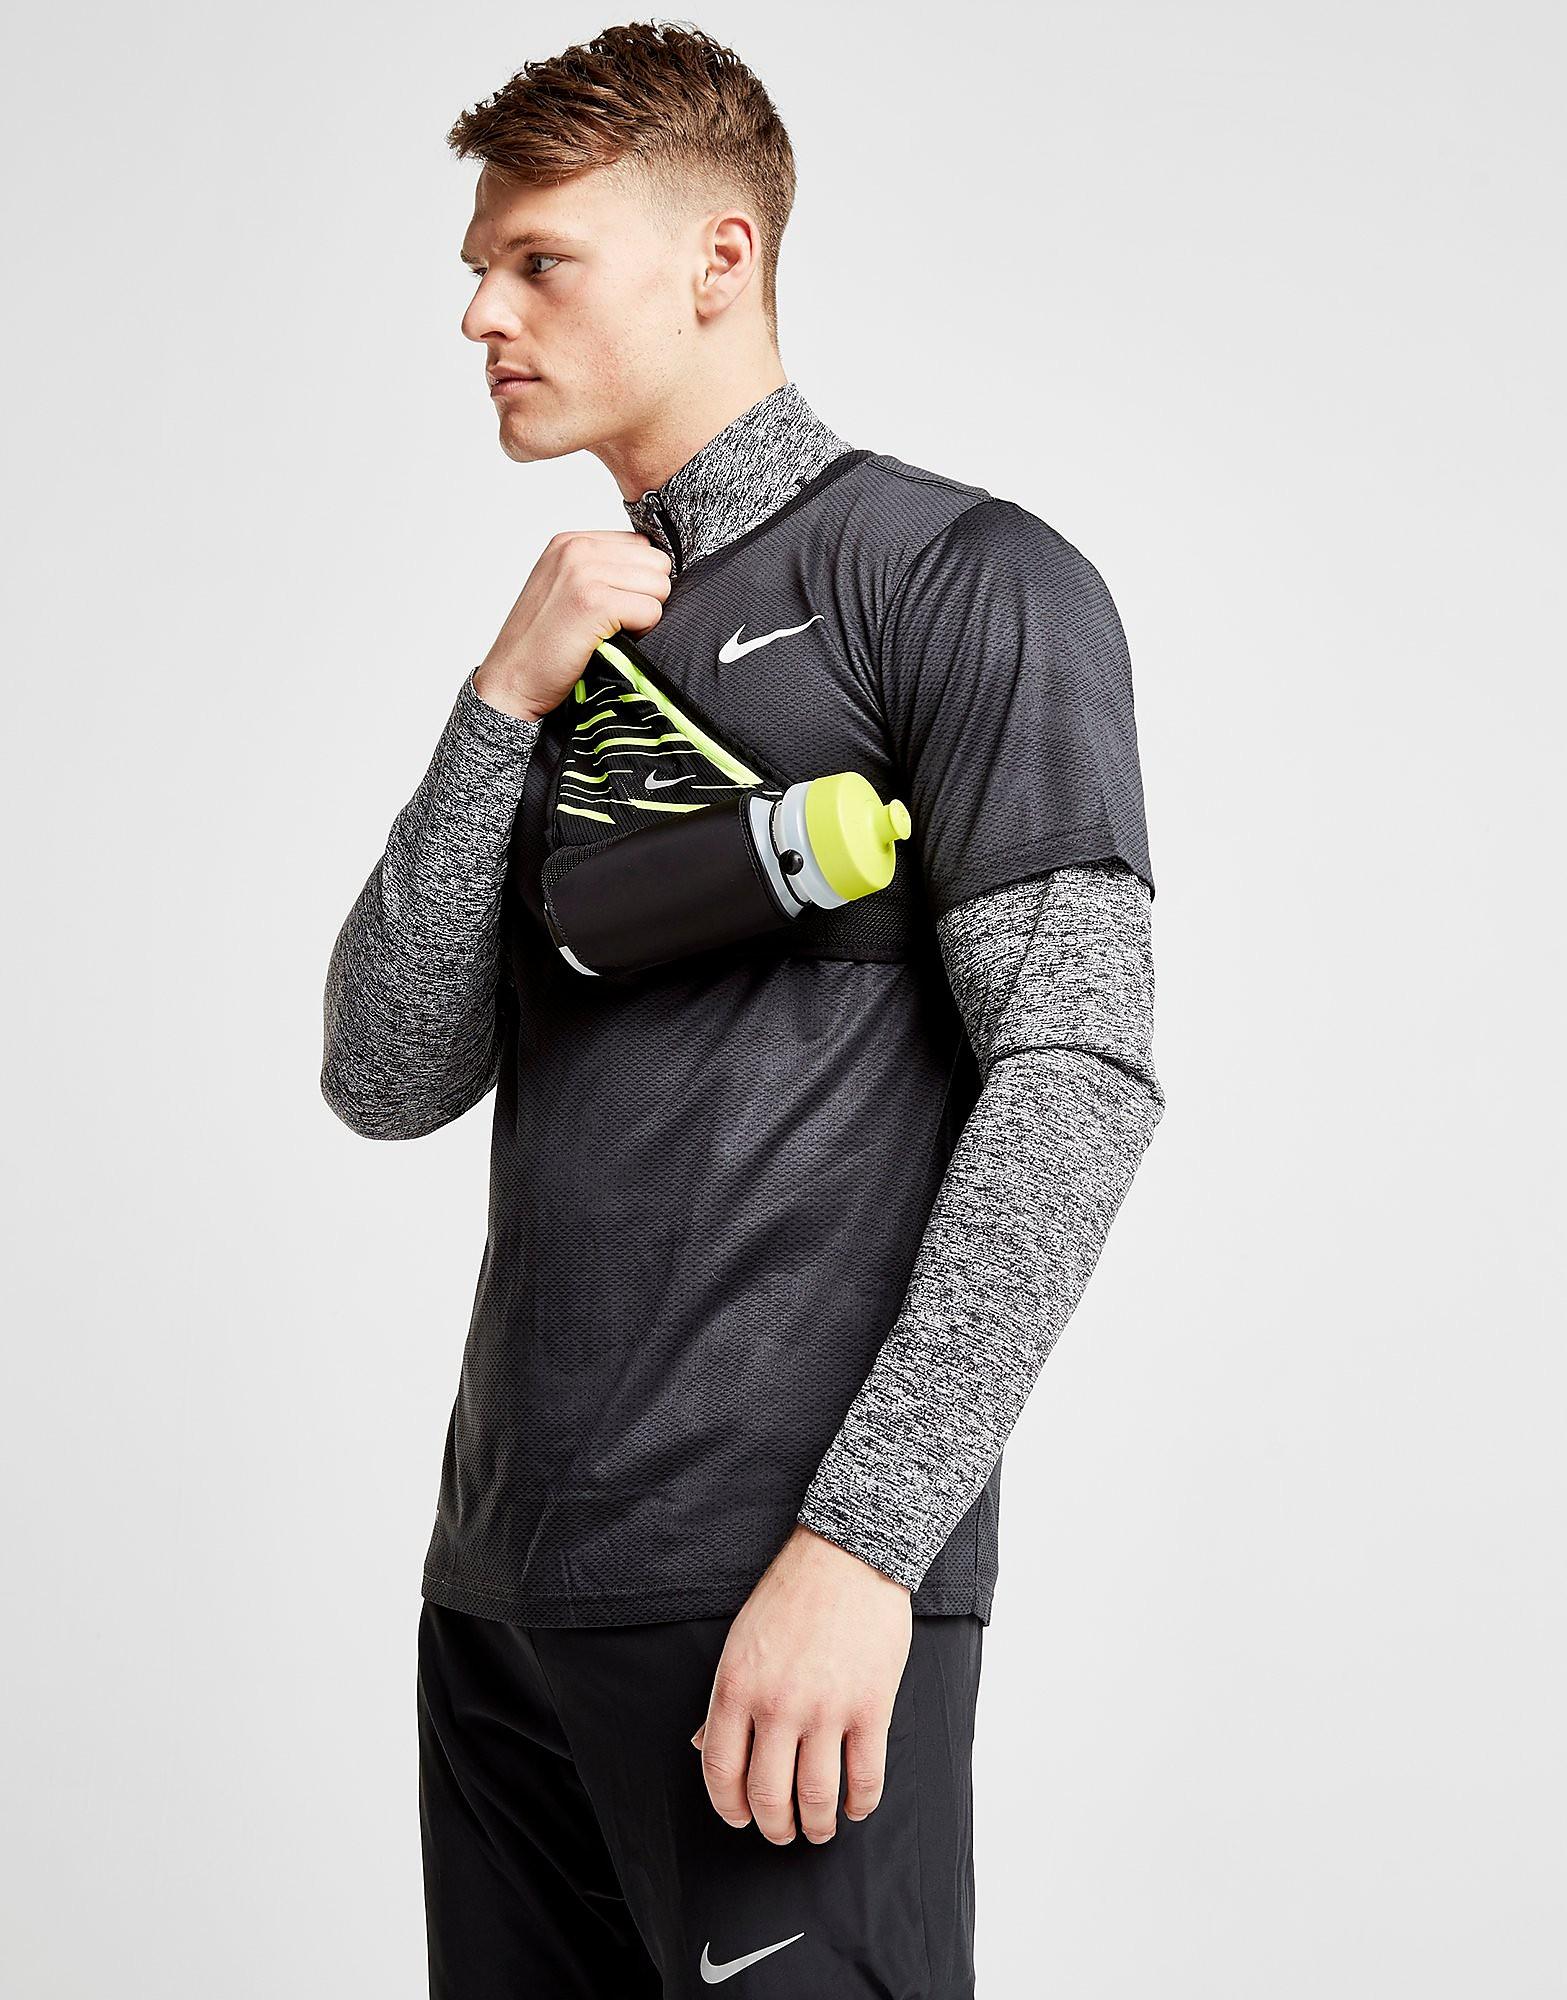 Nike Dri-FIT Camo All Over Print T-Shirt